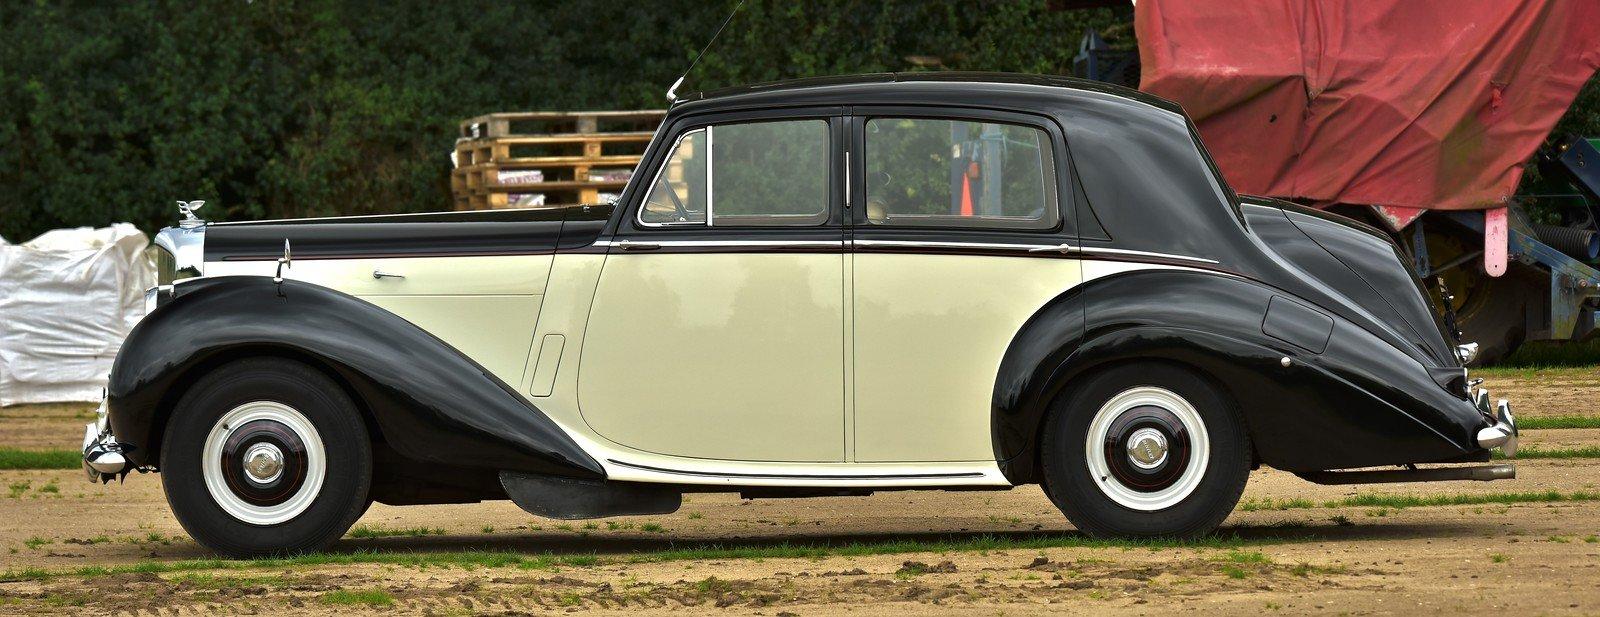 1954 Bentley R Type Standard Steel Saloon For Sale (picture 2 of 6)